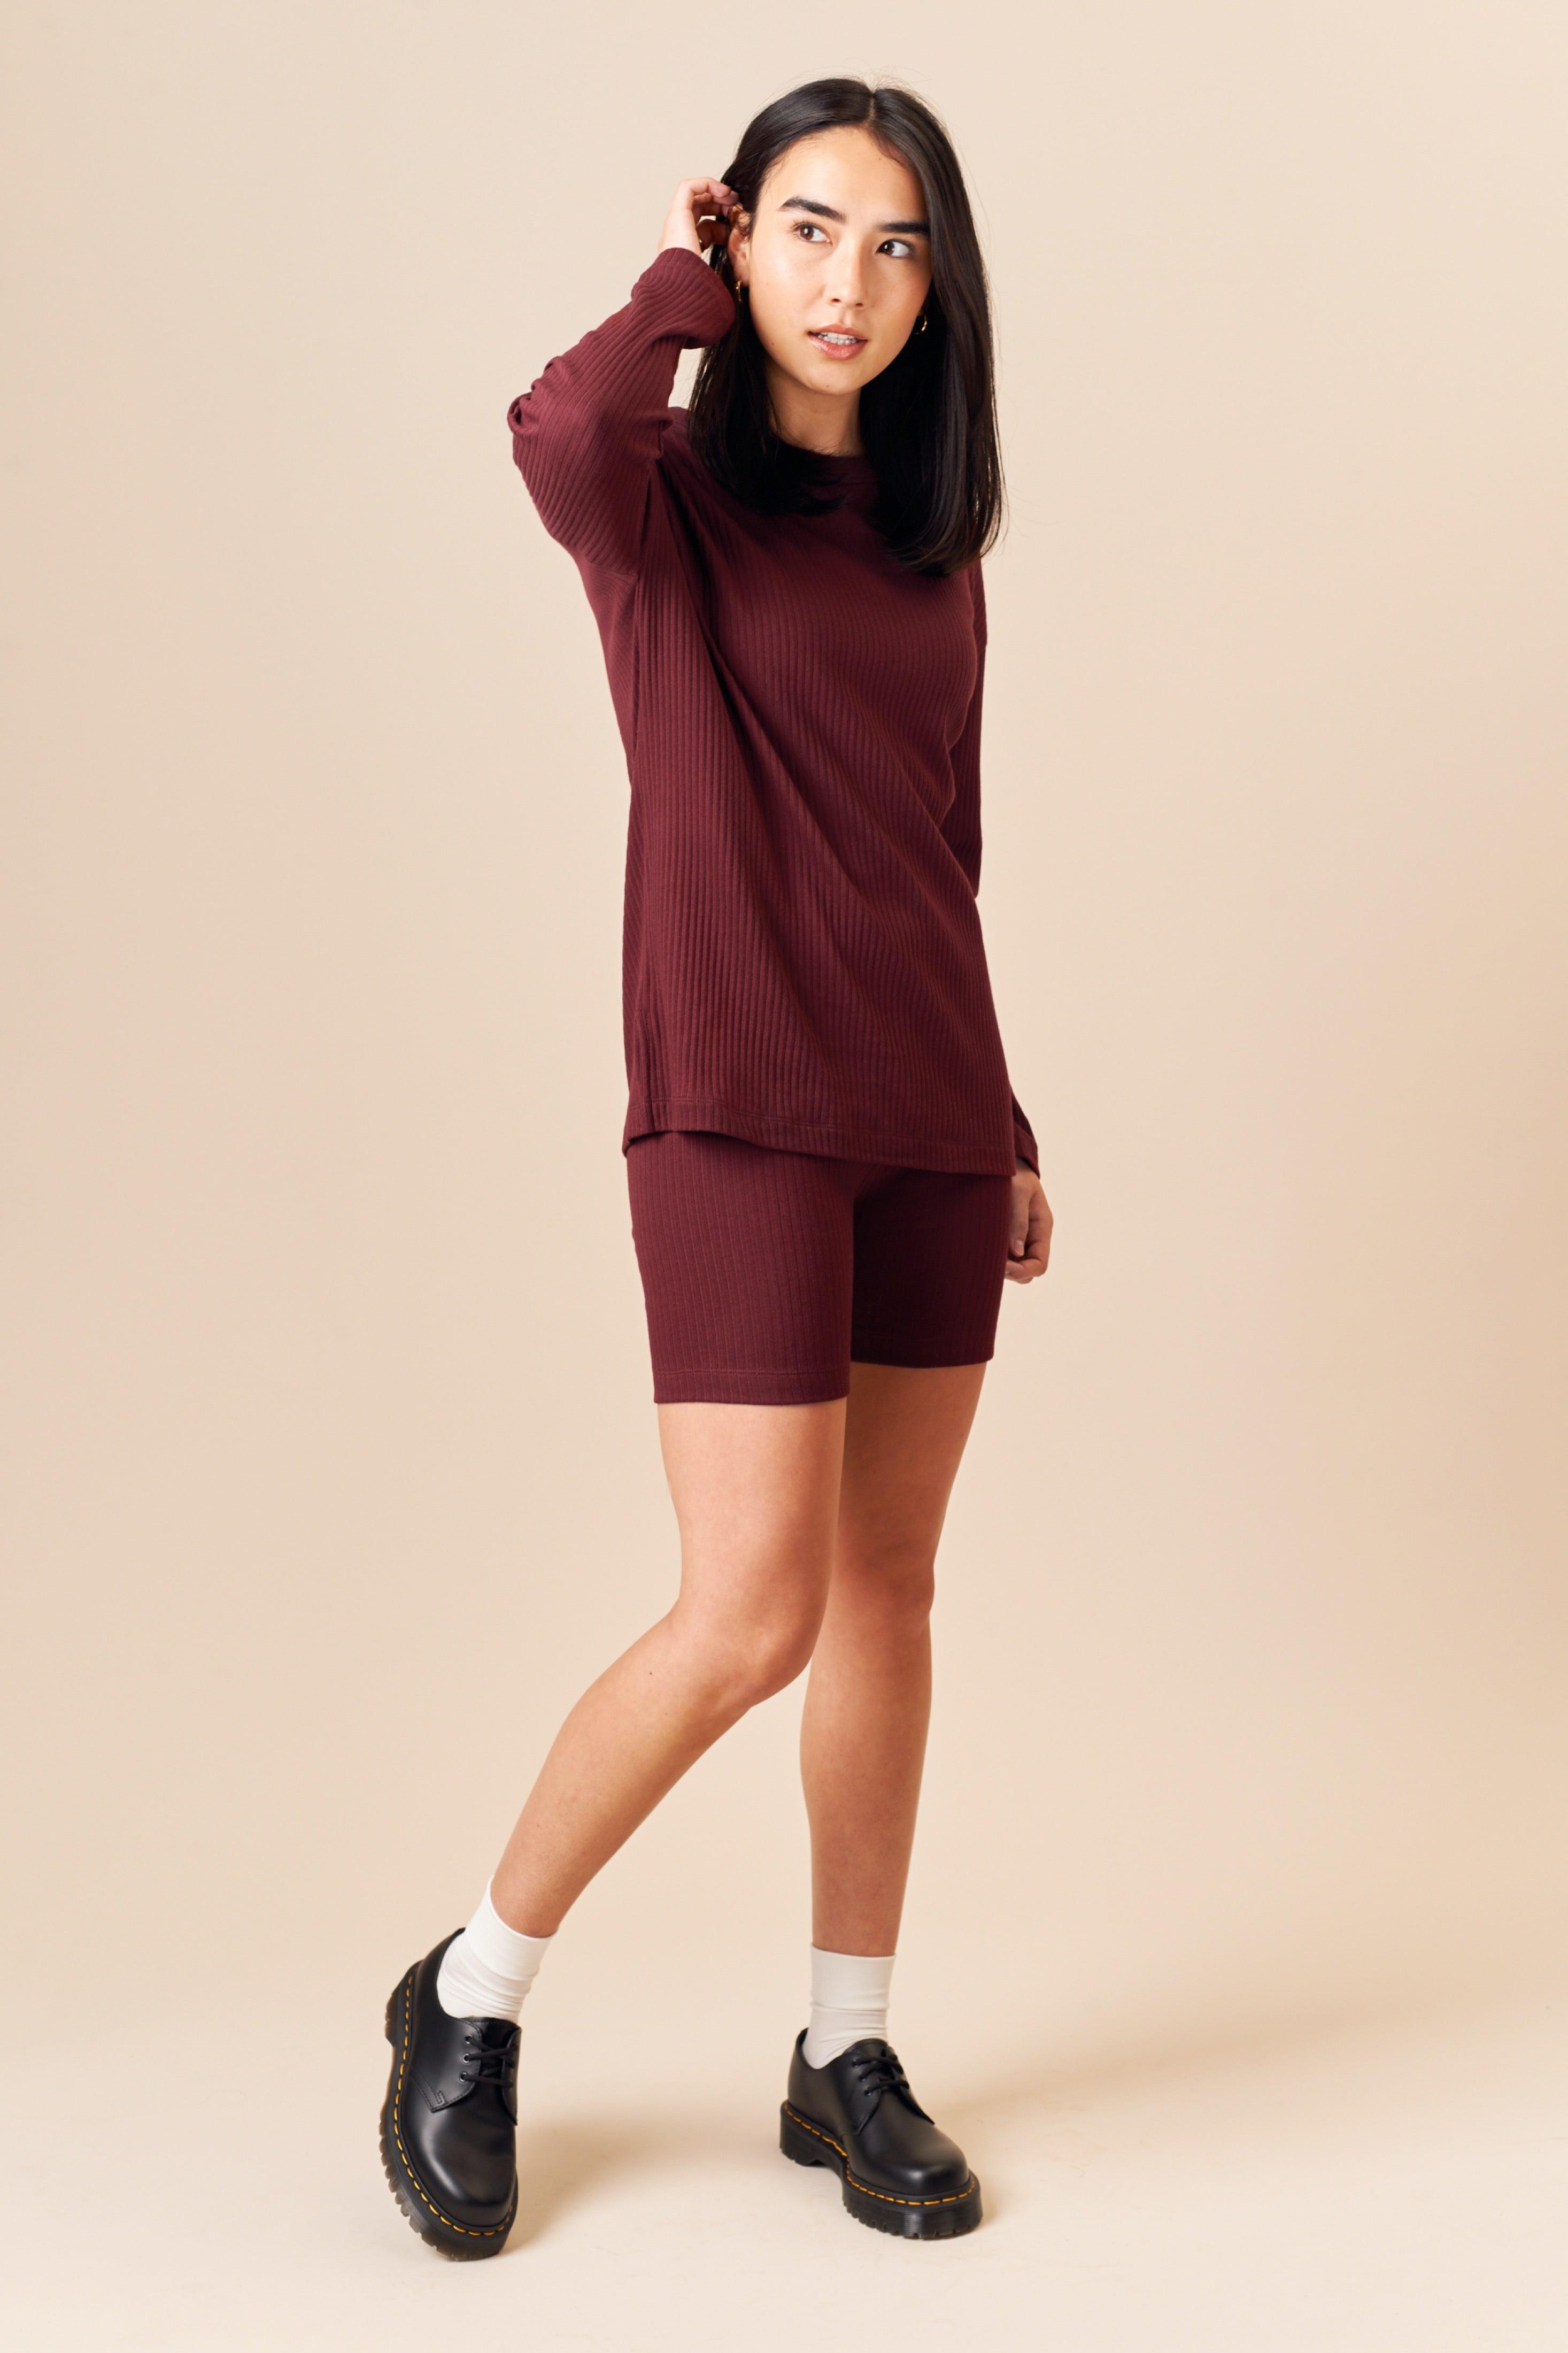 Kotn Women's Ribbed Shorts in Zinfandel, Size XS